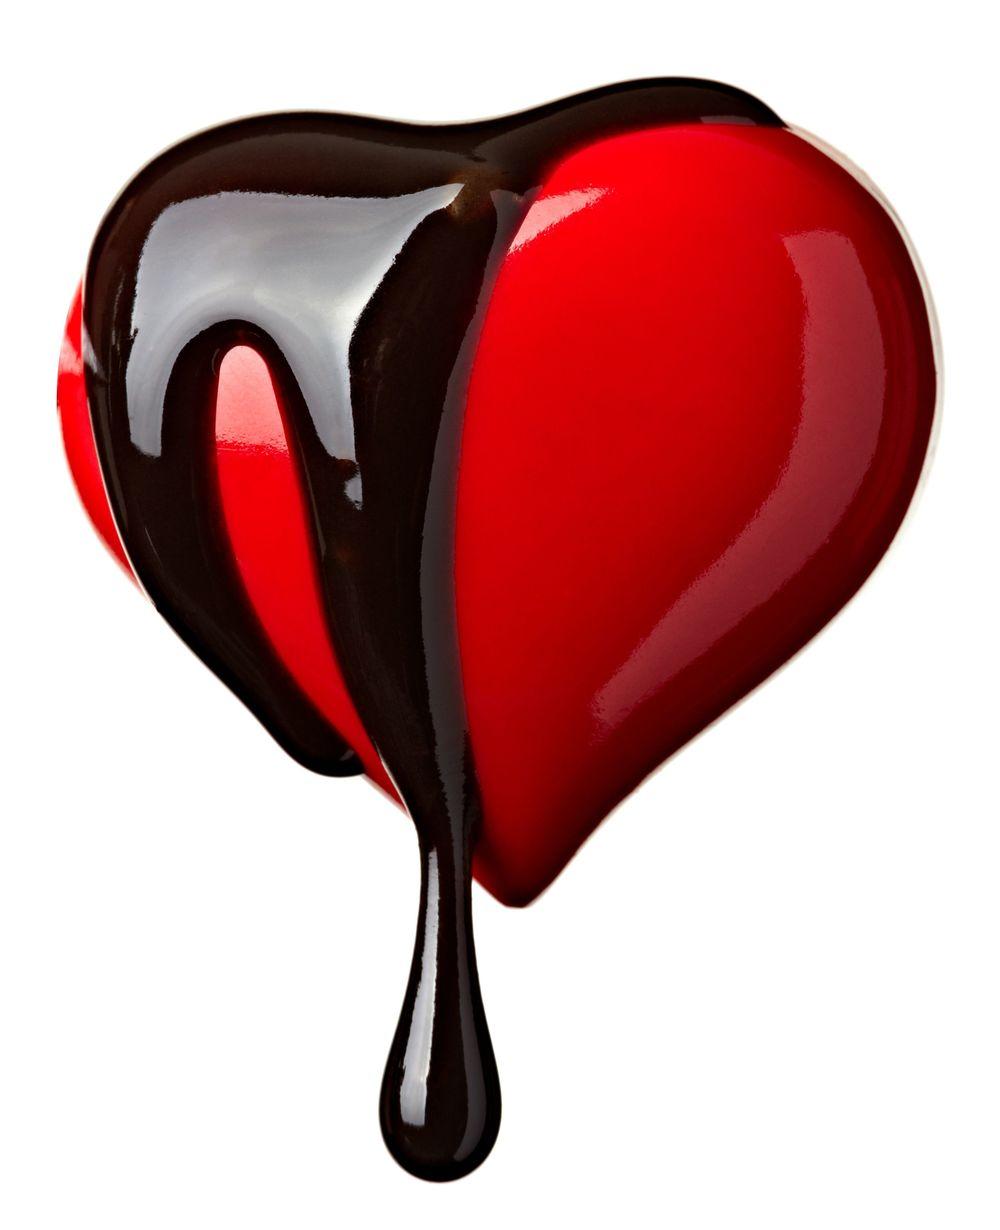 heart health and chocolate